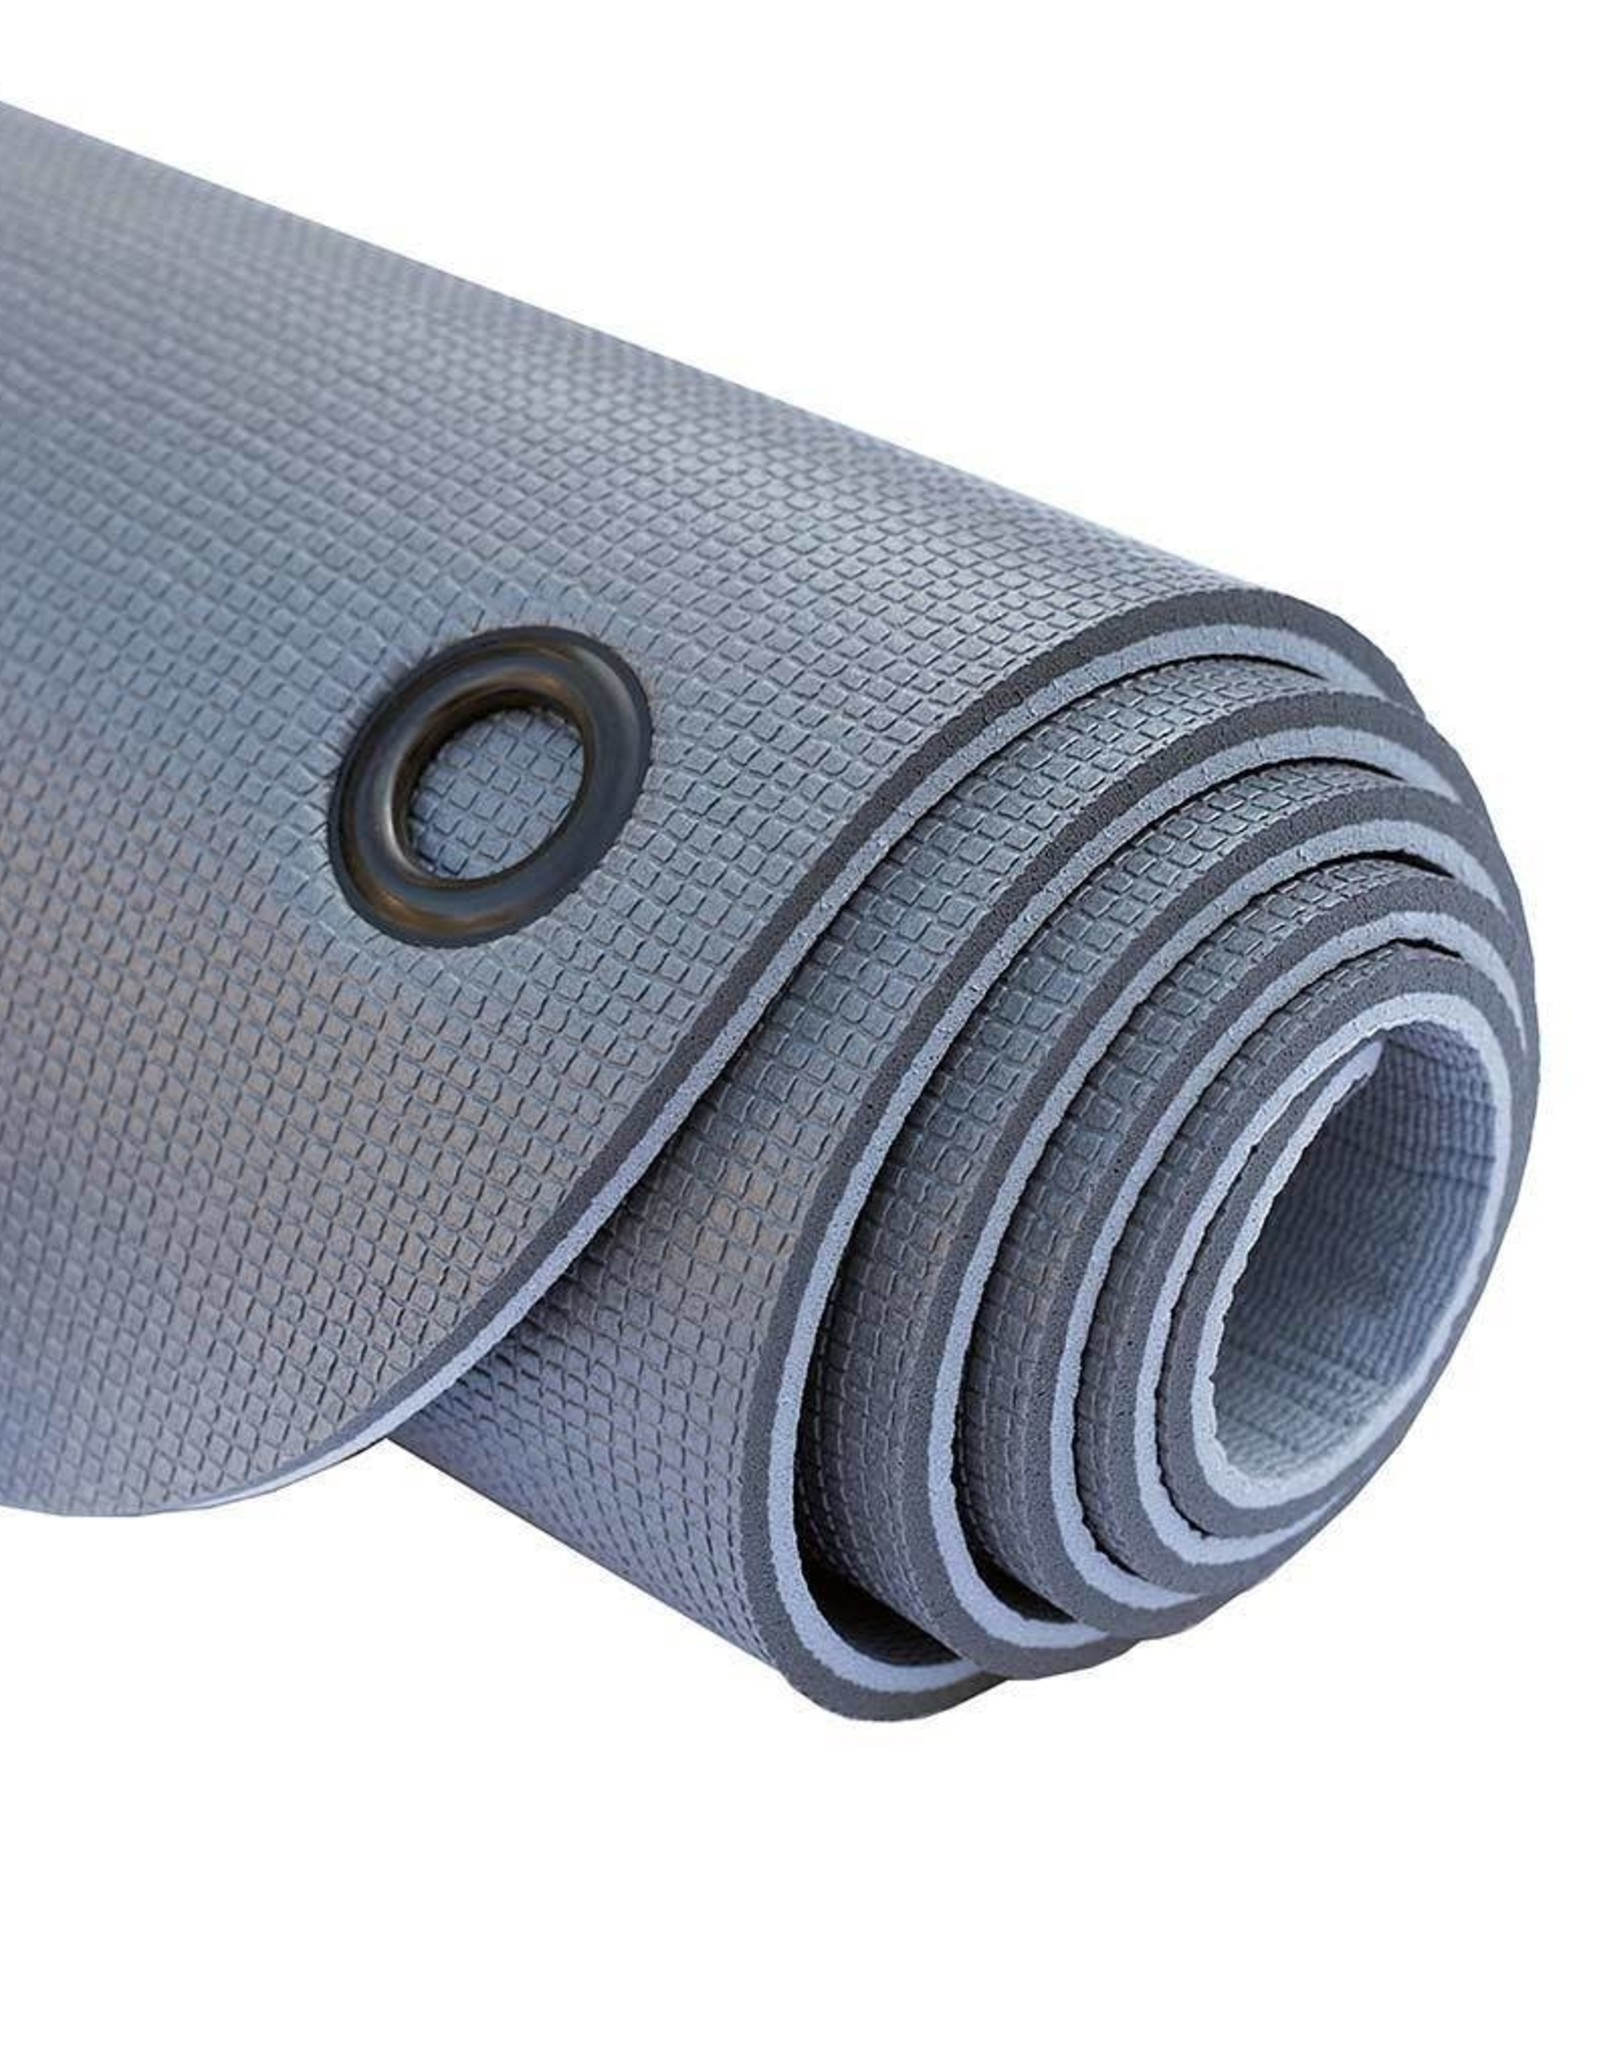 Manduka MDK Fitness mat 8MM-BLACK GREY